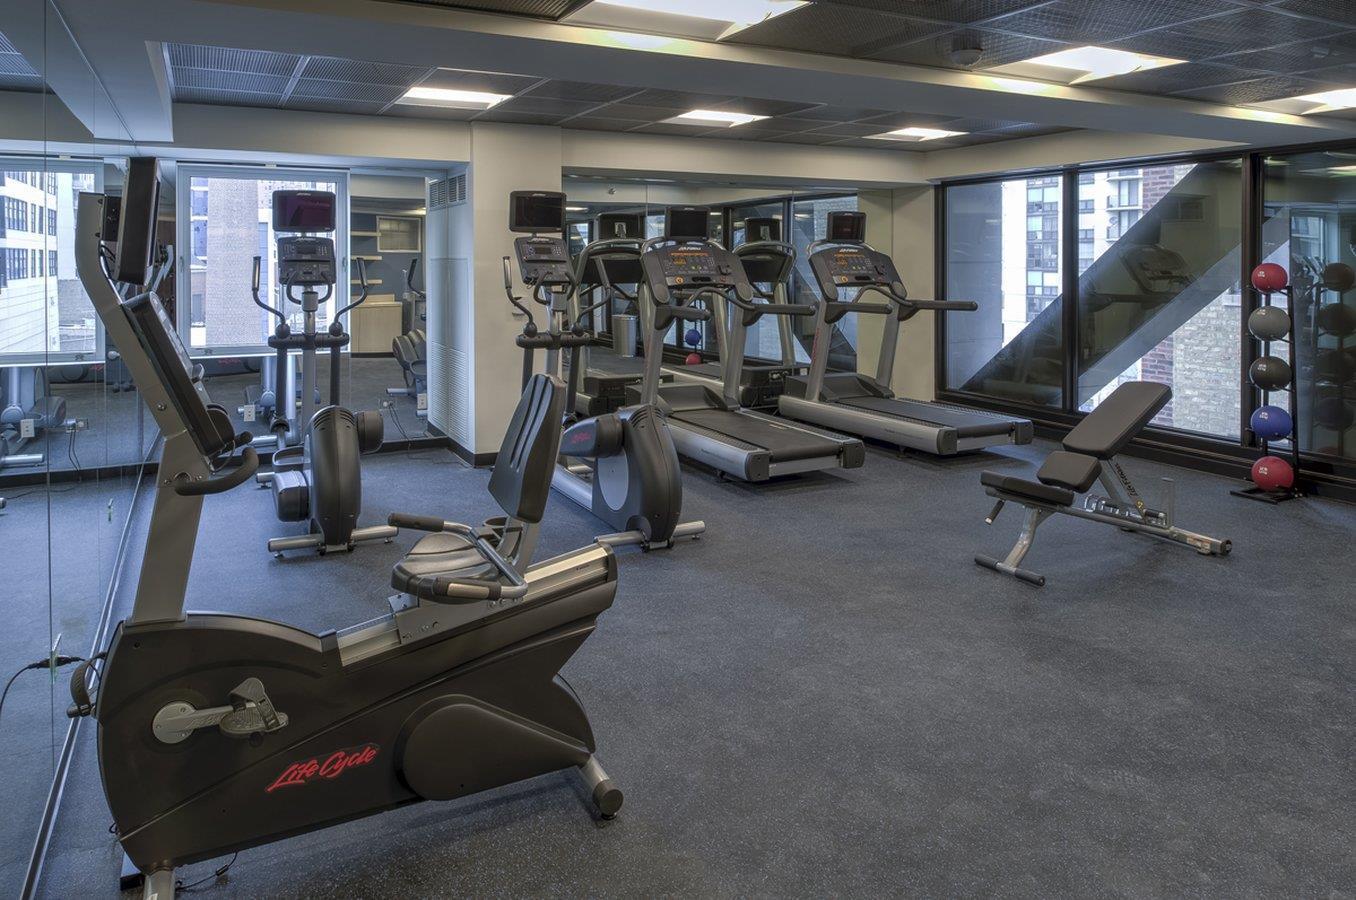 Fitness/ Exercise Room - Godfrey Hotel Chicago